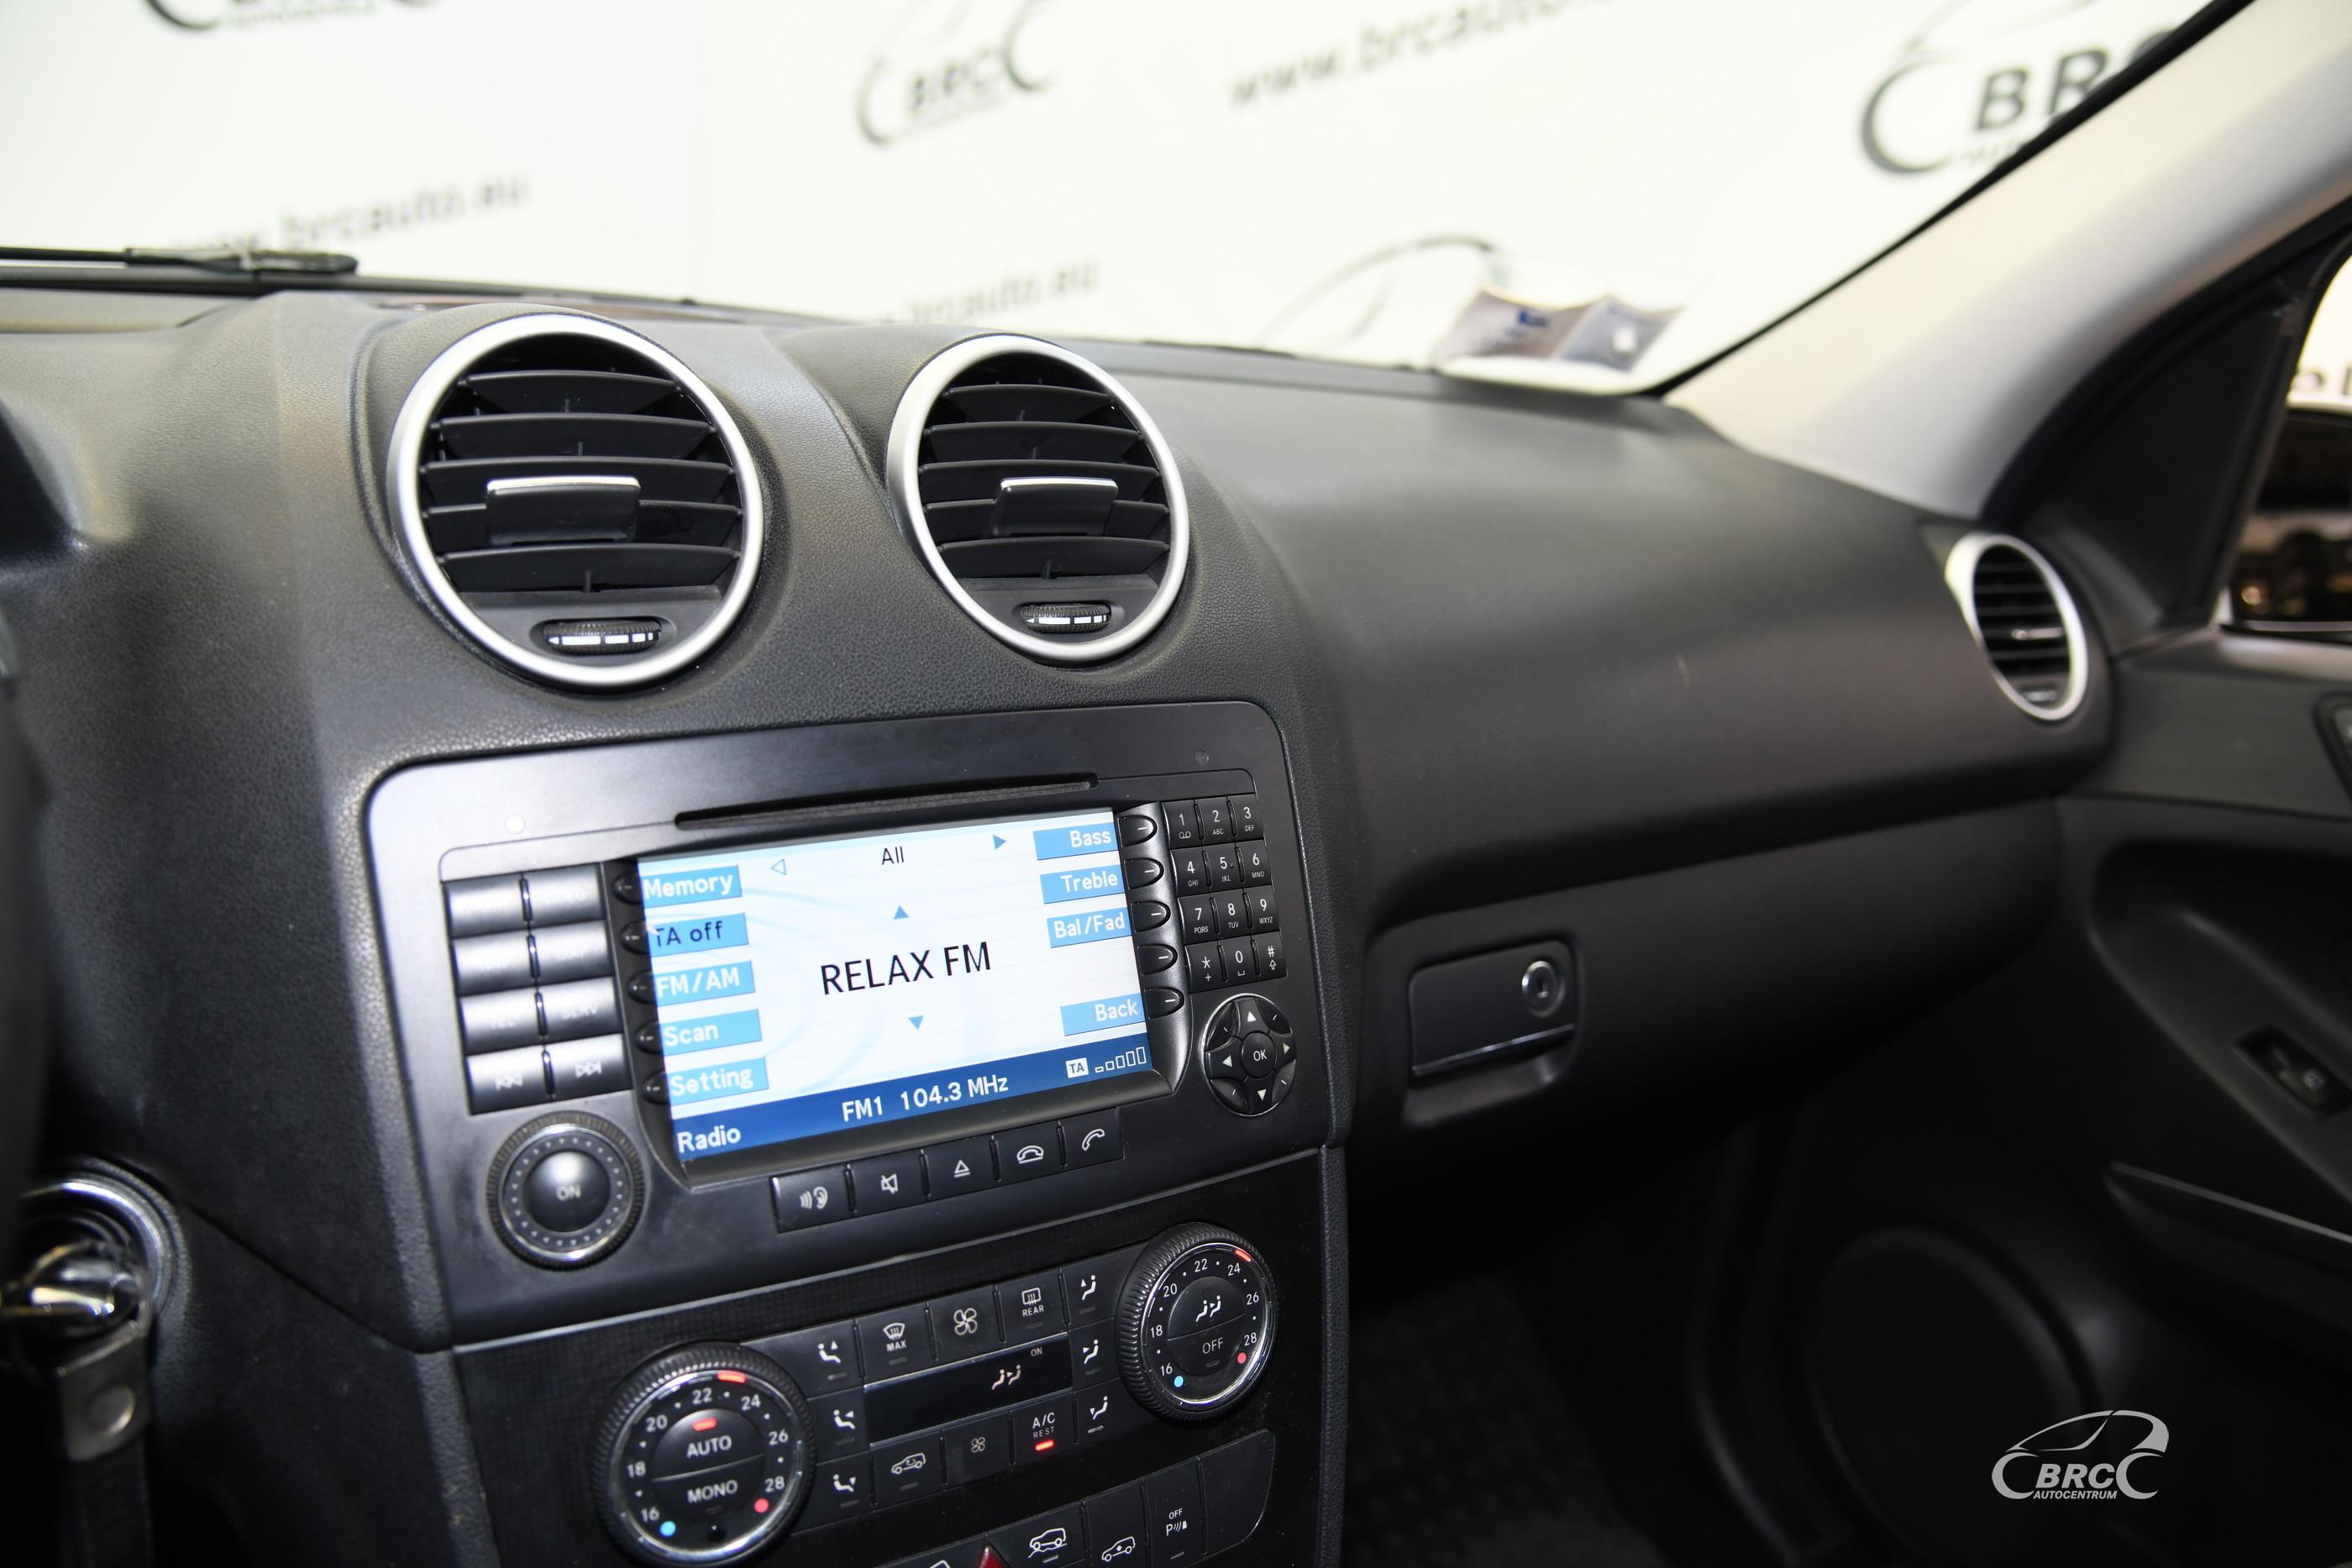 Mercedes-Benz ML 320 CDI Automatas